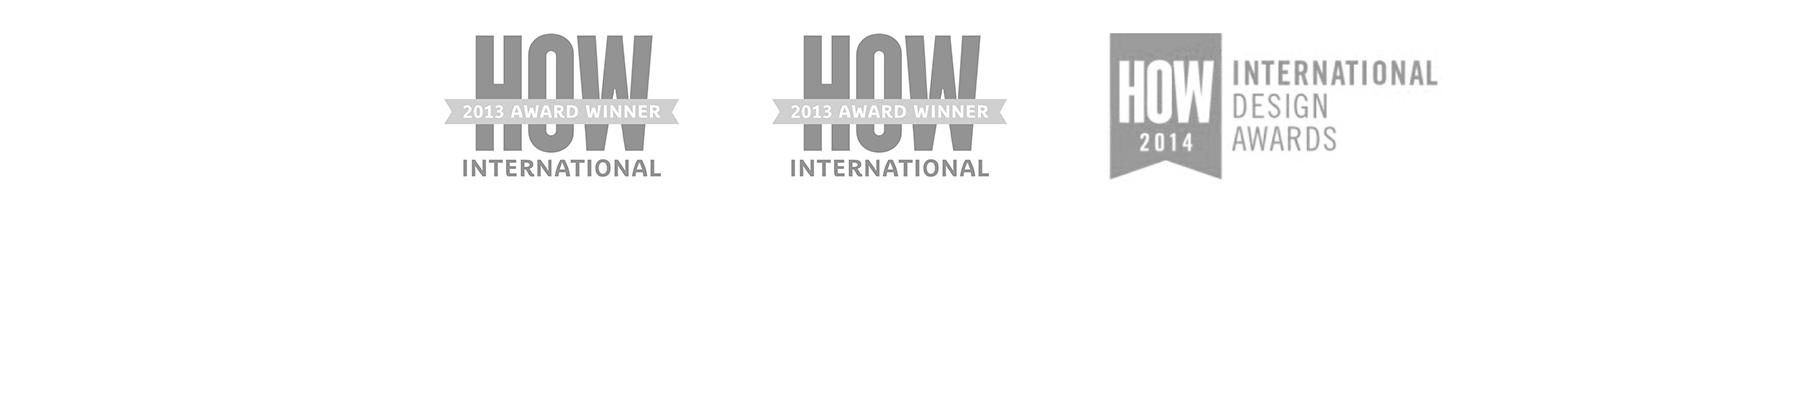 Author Brand Studio branding agency brand design logo design web design graphic design for small medium size business award winning design HOW international design awards